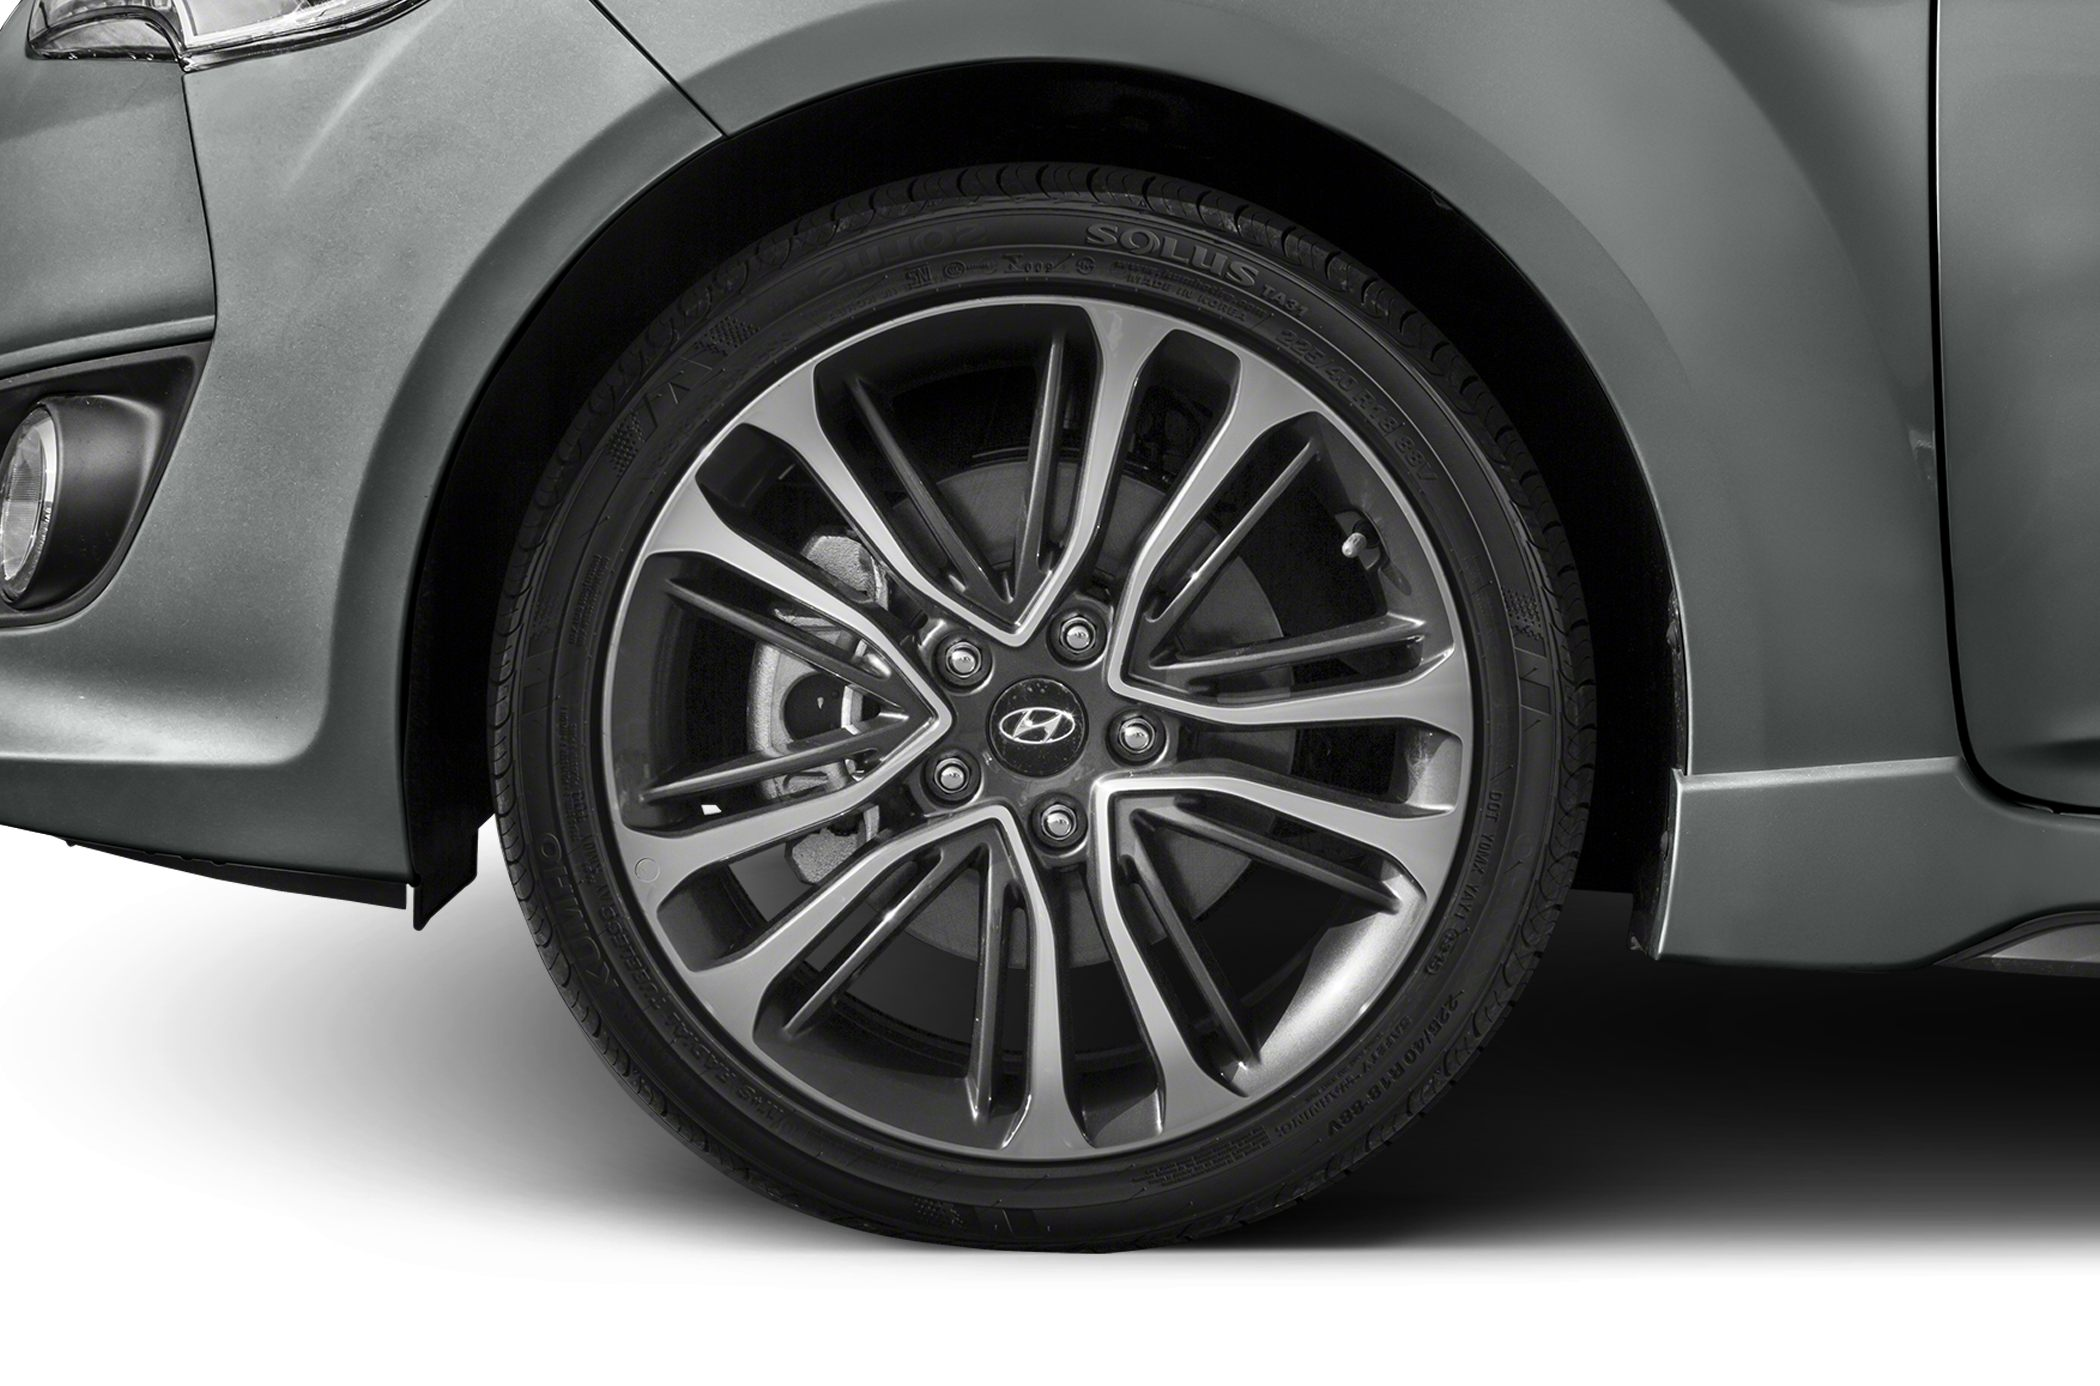 2017 Hyundai Veloster For Sale In Ajax Ajax Hyundai